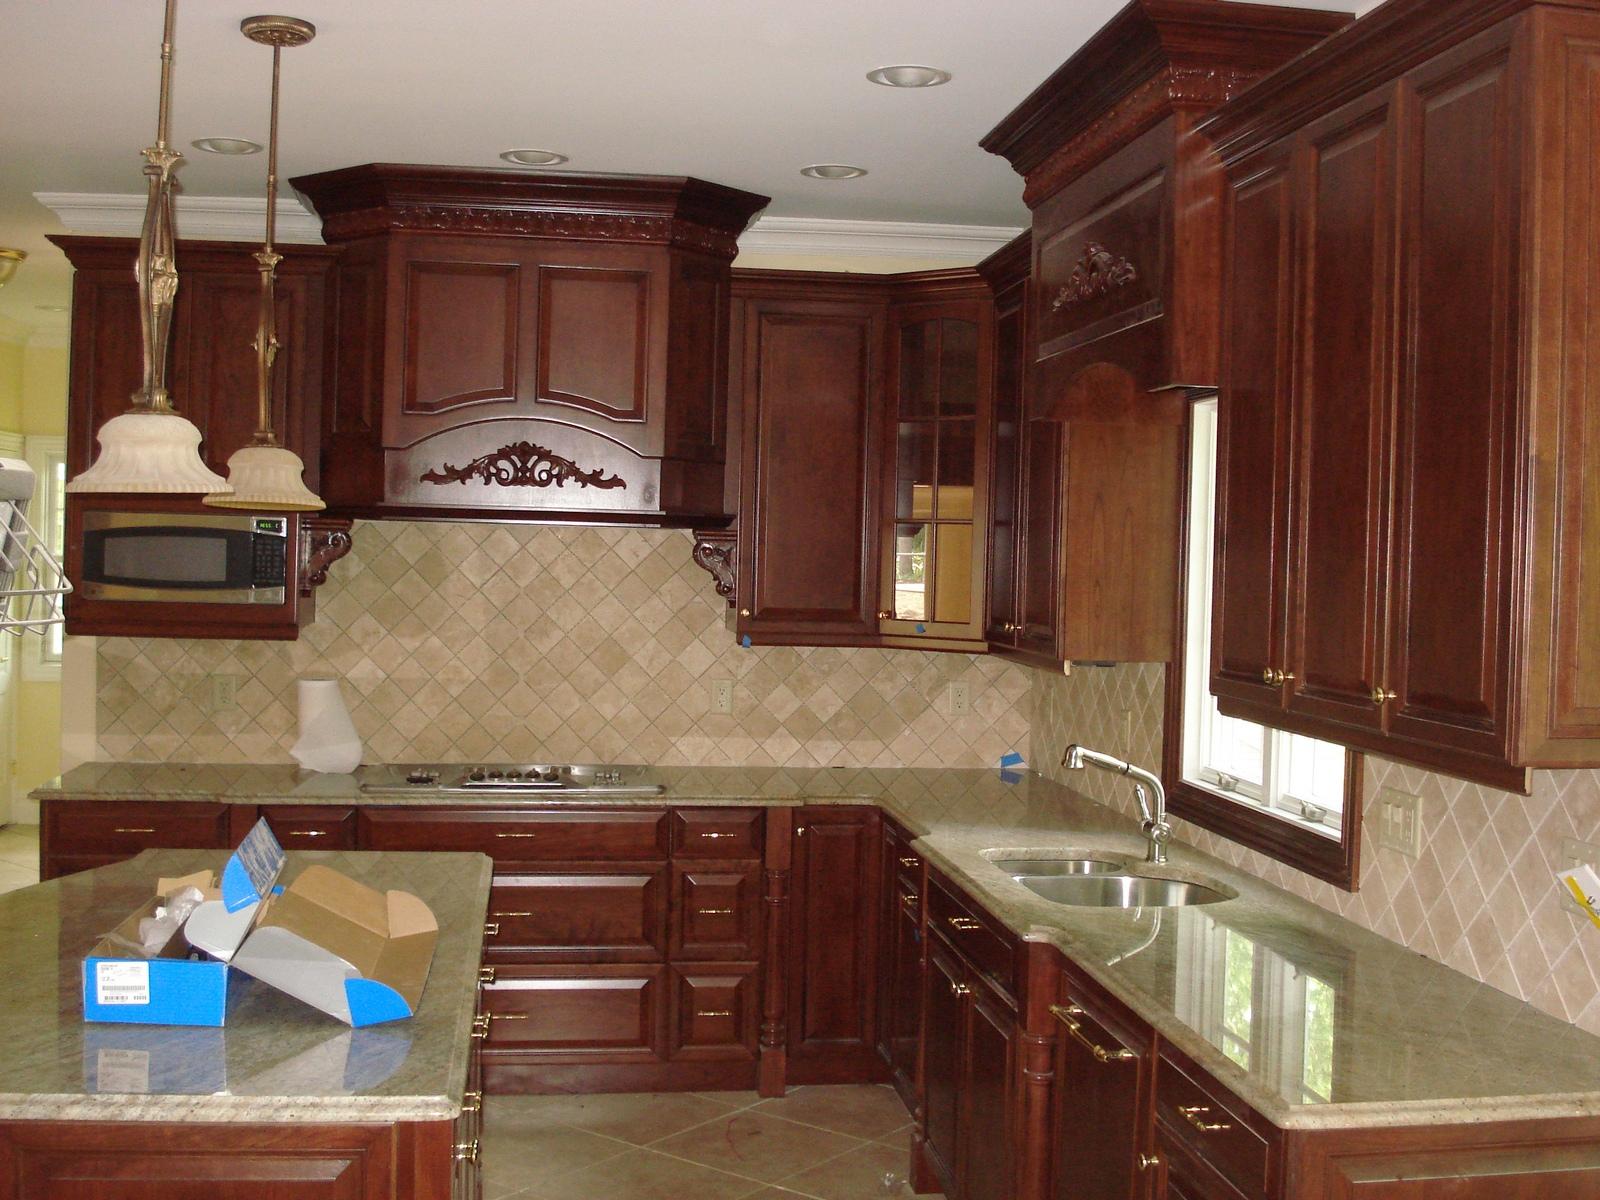 kitchen cabinets kitchen cabinets nj kitchen cabintes by Crown Molding NJ 13 kitchen cabinets KC6